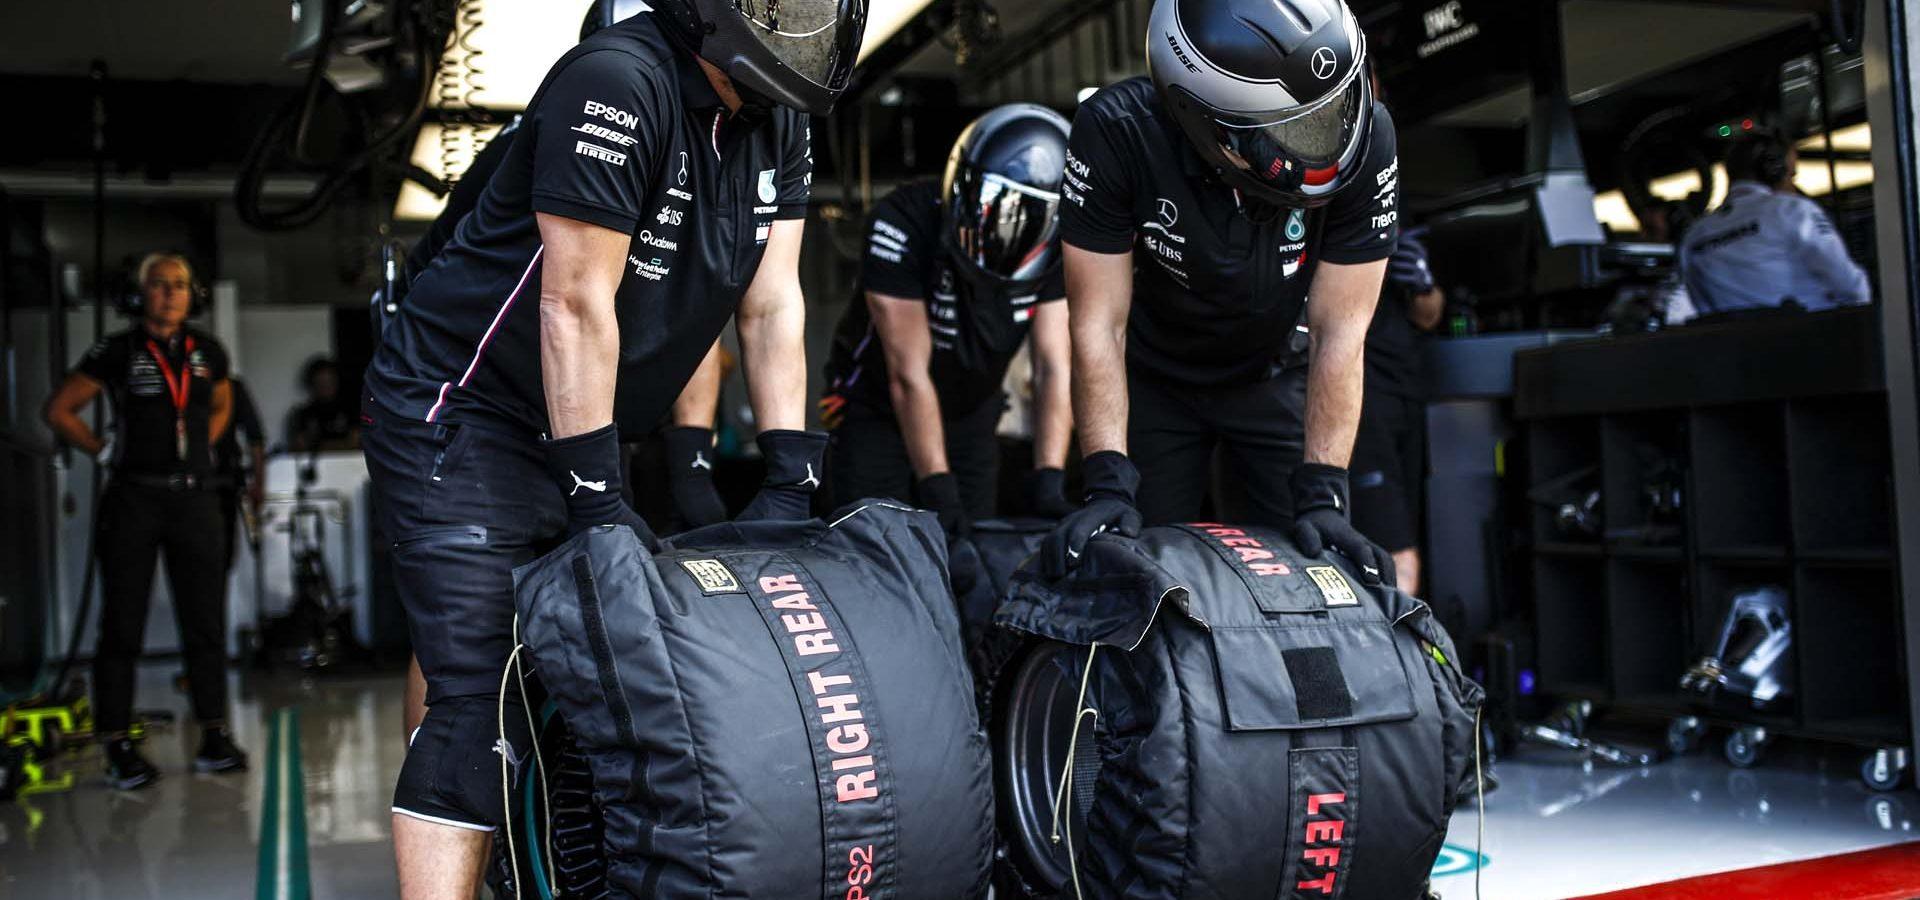 2019 French Grand Prix, Friday - Wolfgang Wilhelm Mercedes tires, Pirelli tyre warmer